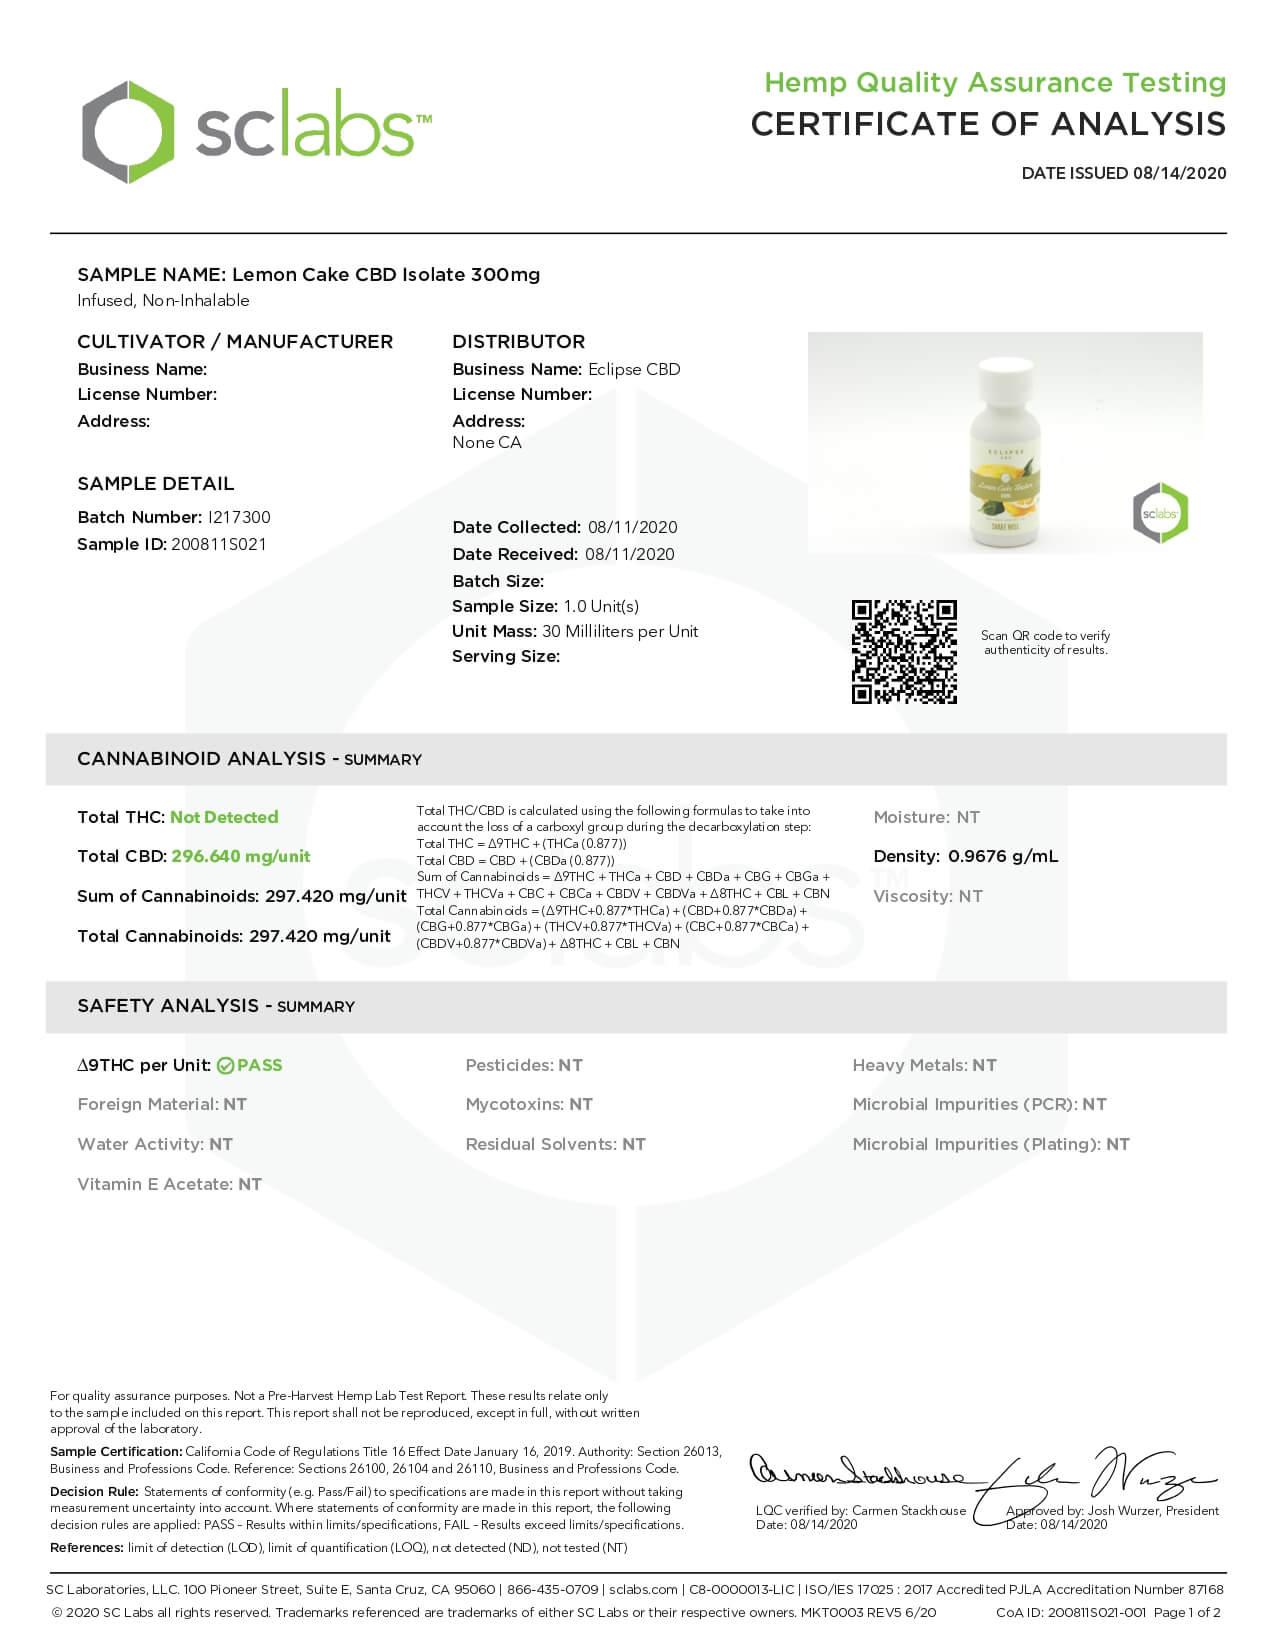 Eclipse CBD MCT Tincture Lemon Cake 300mg Lab Report